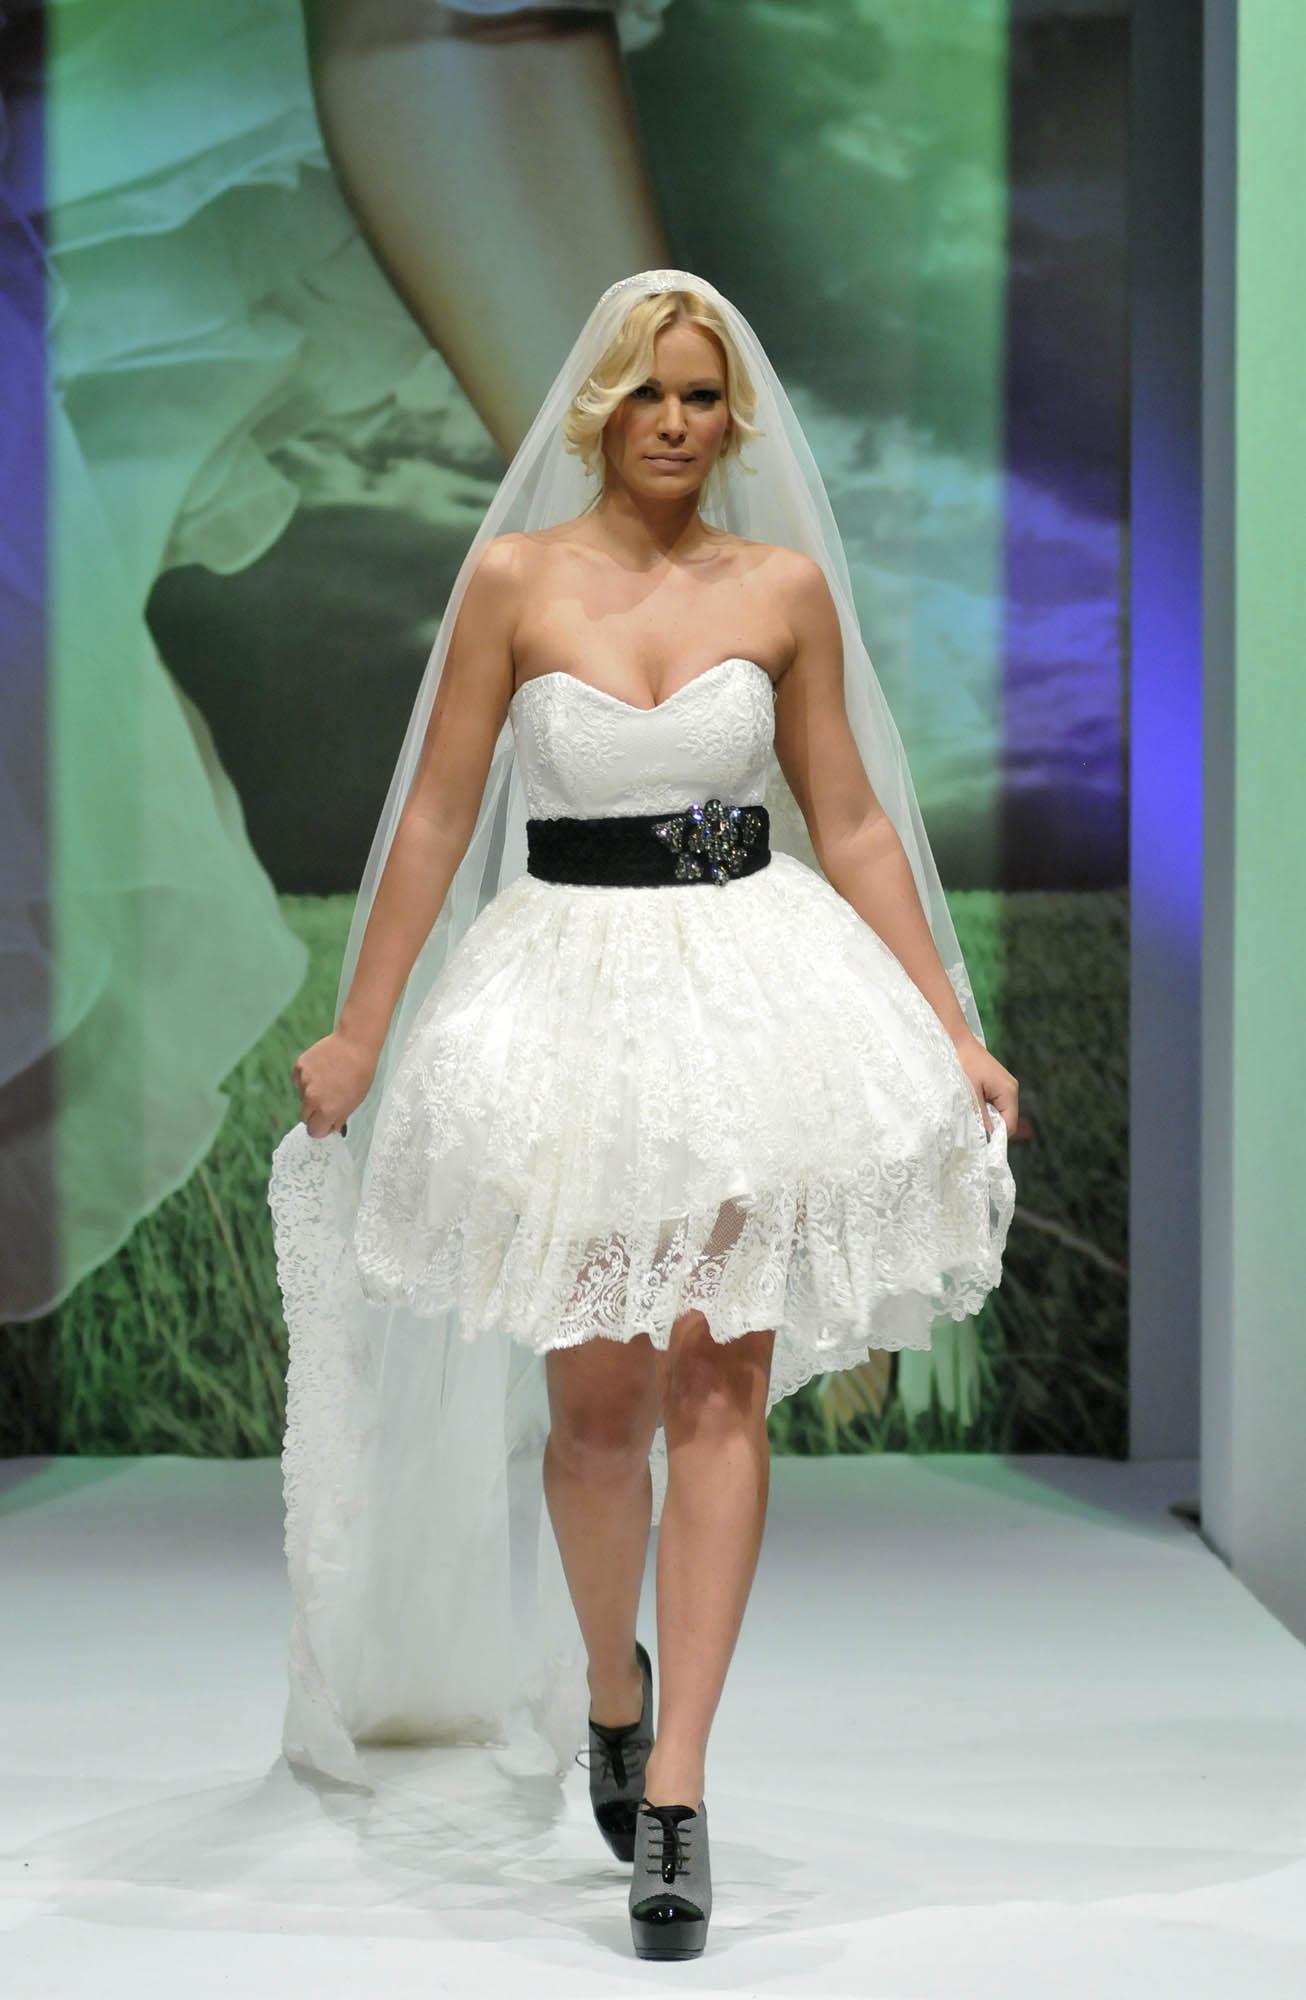 Wedding Show 2011 Natasa Bekvalac